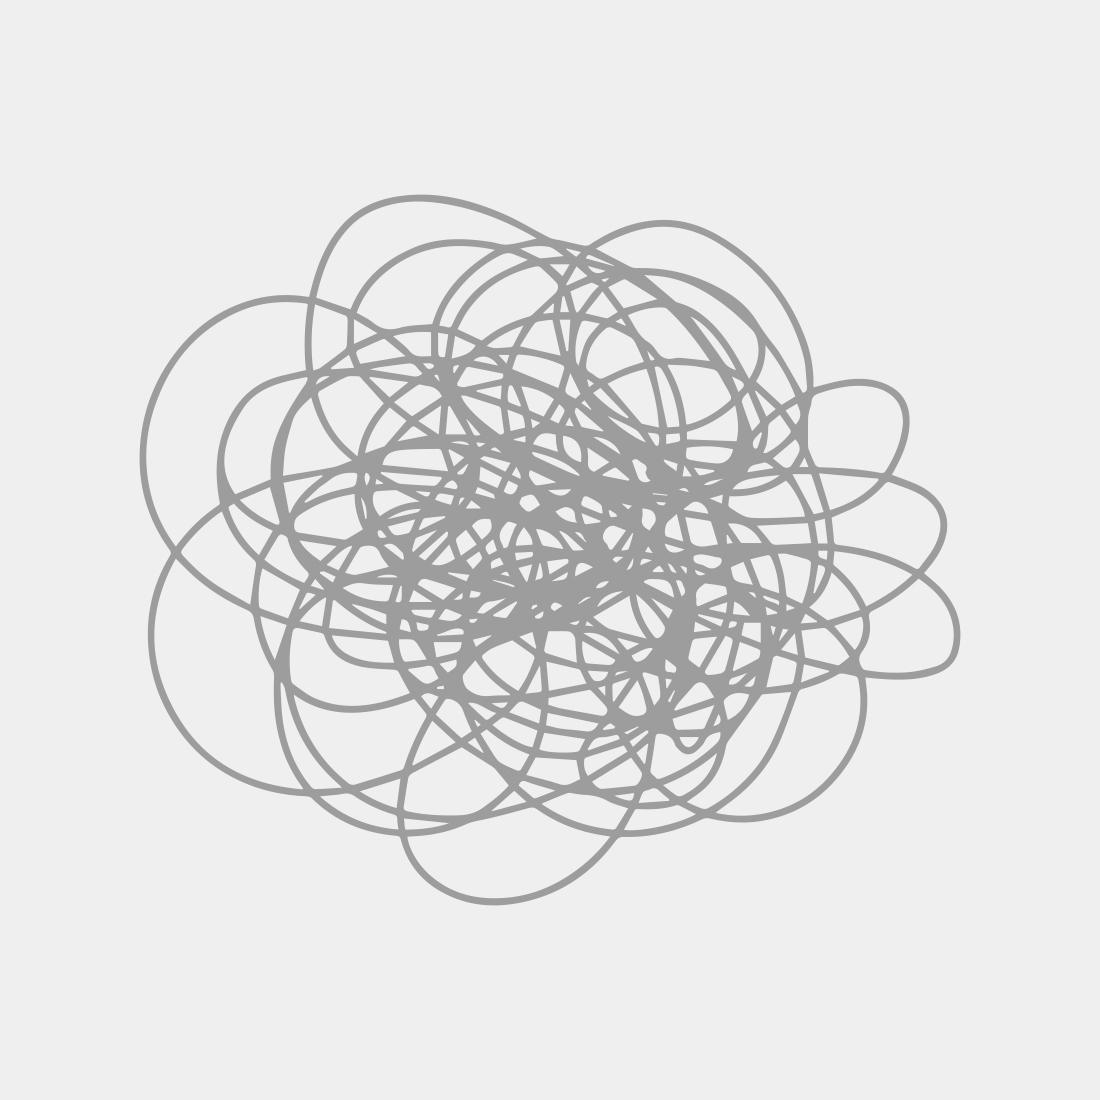 Albert Irvin OBE RA Untitled opus w.21 (framed)